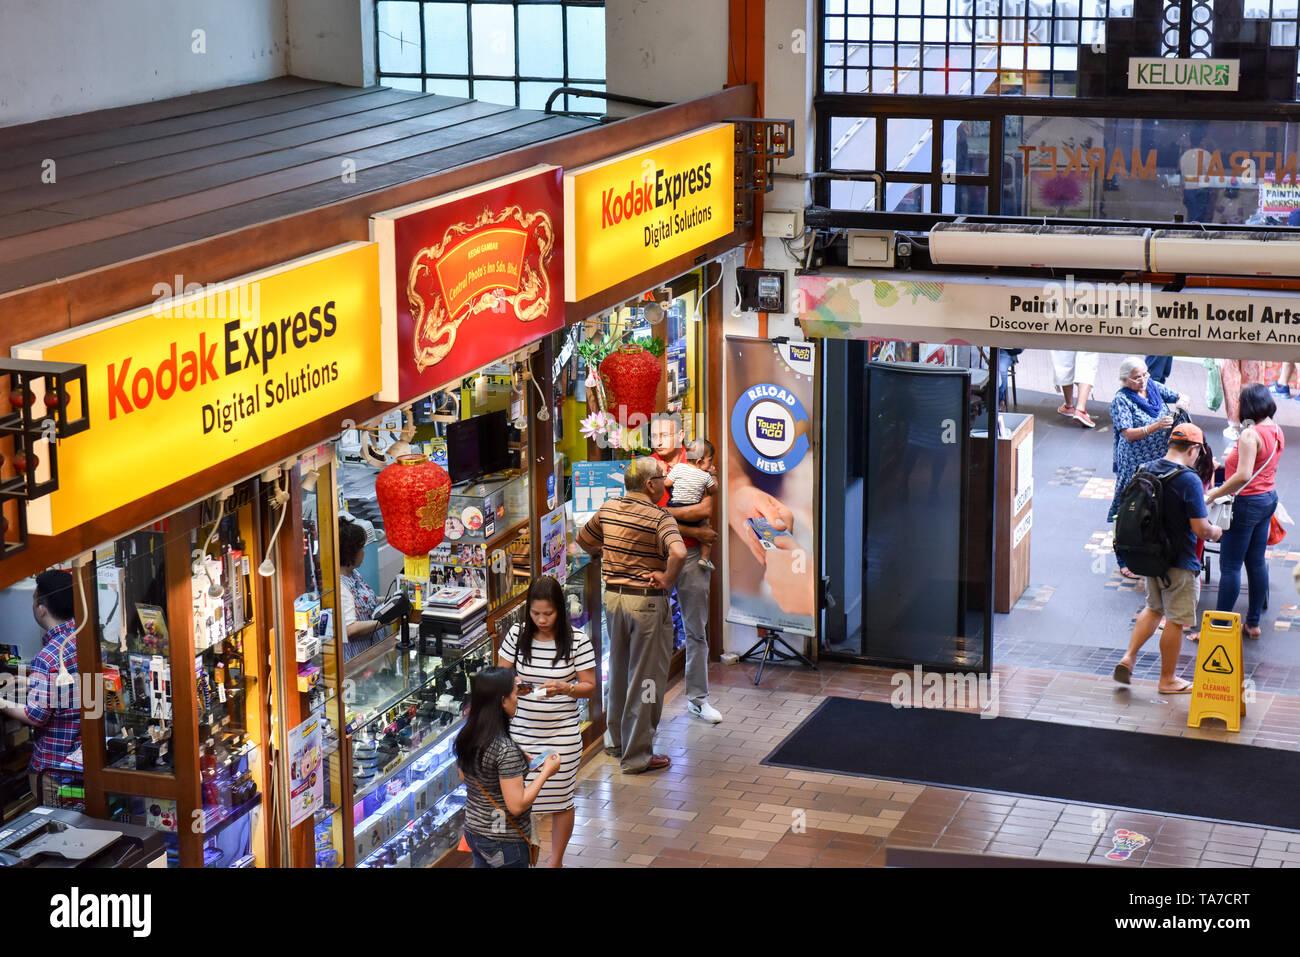 Kodak Express shop, Central Market, Kuala Lumpur Stock Photo